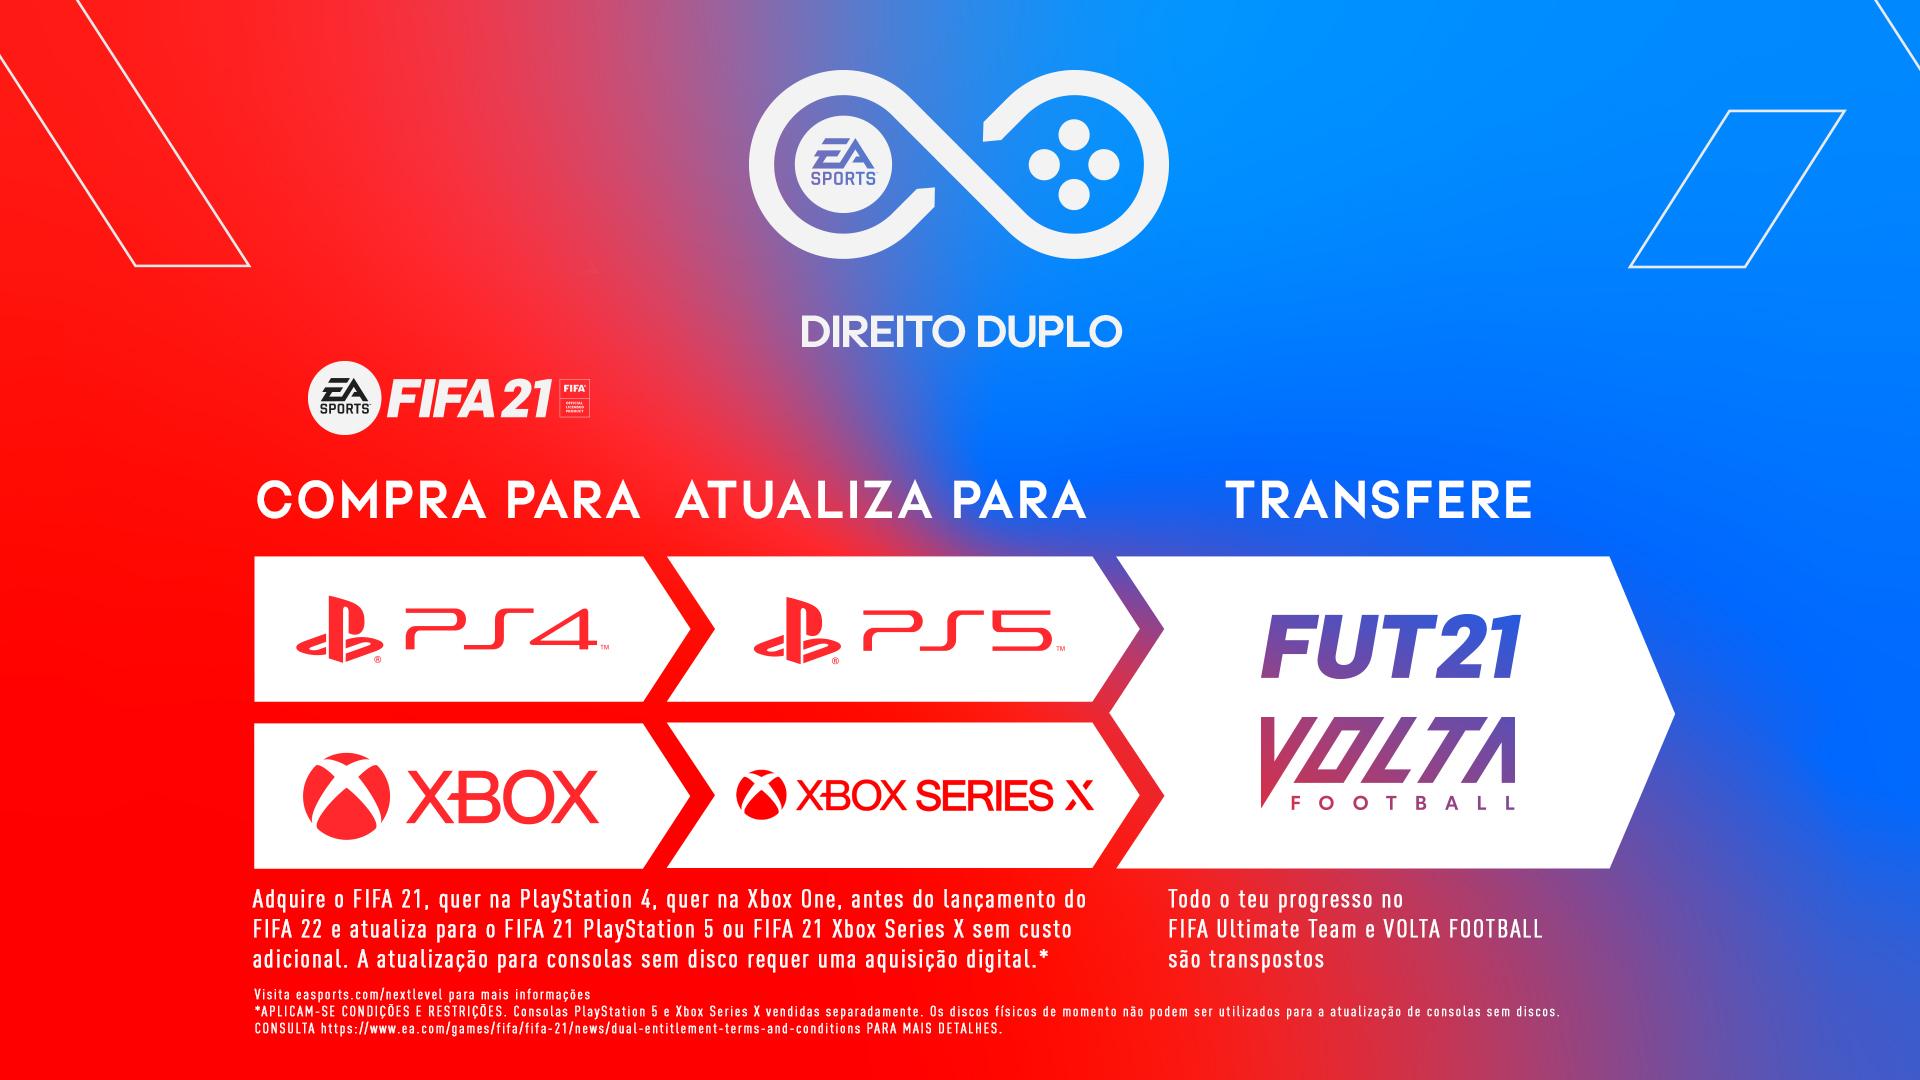 EA_DualEntitlement_FIFA21_PT.jpg